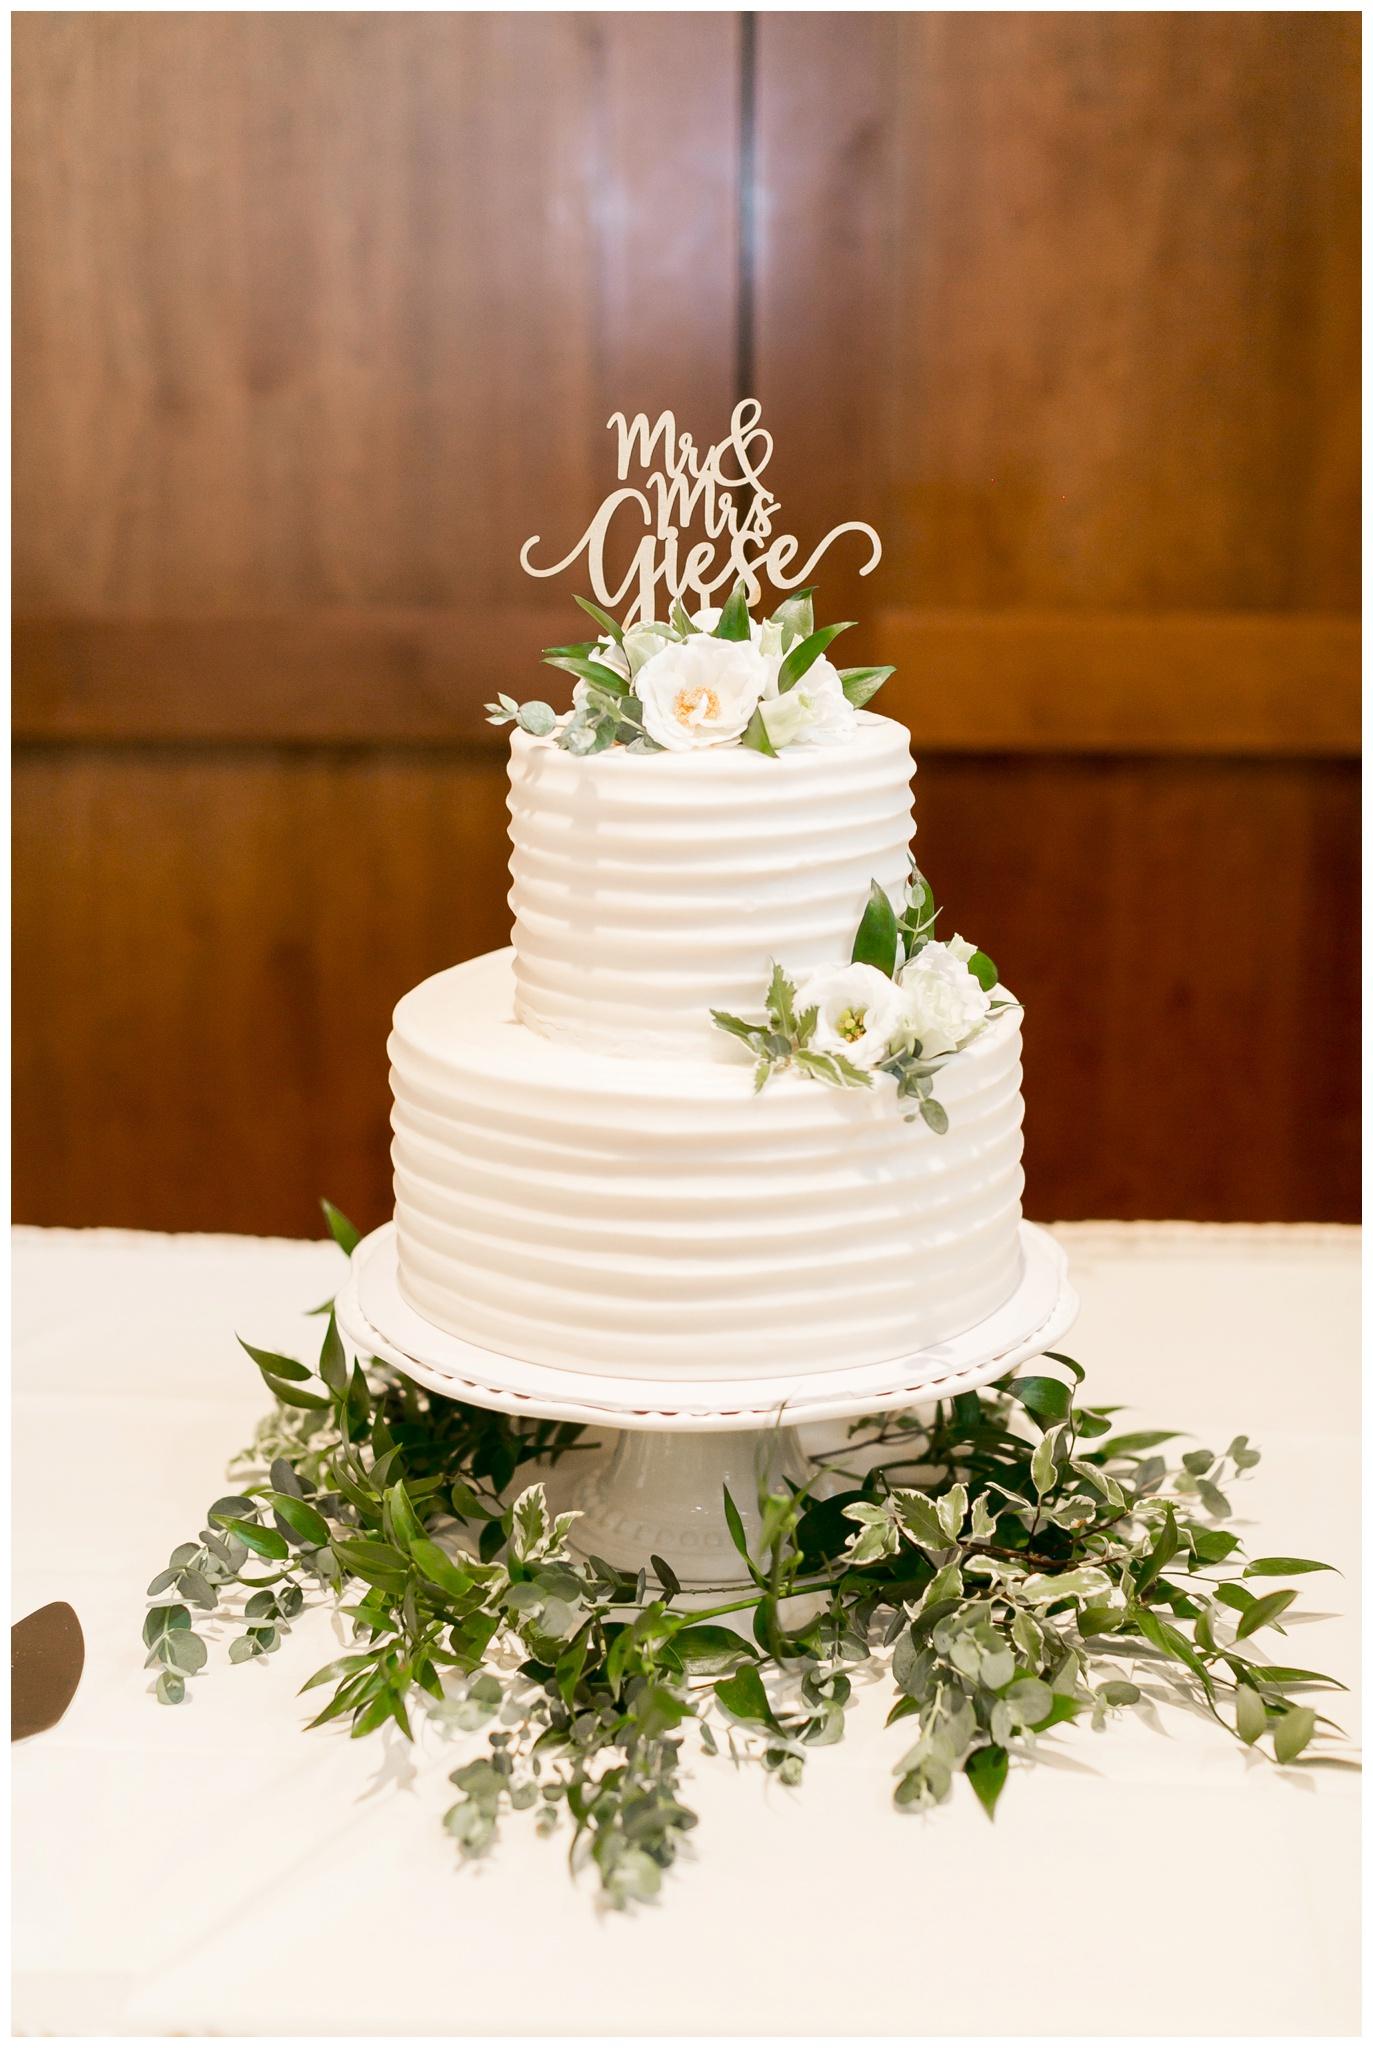 Union_south_Wedding_Madison_Wisconsin_Caynay_Photo_3688.jpg